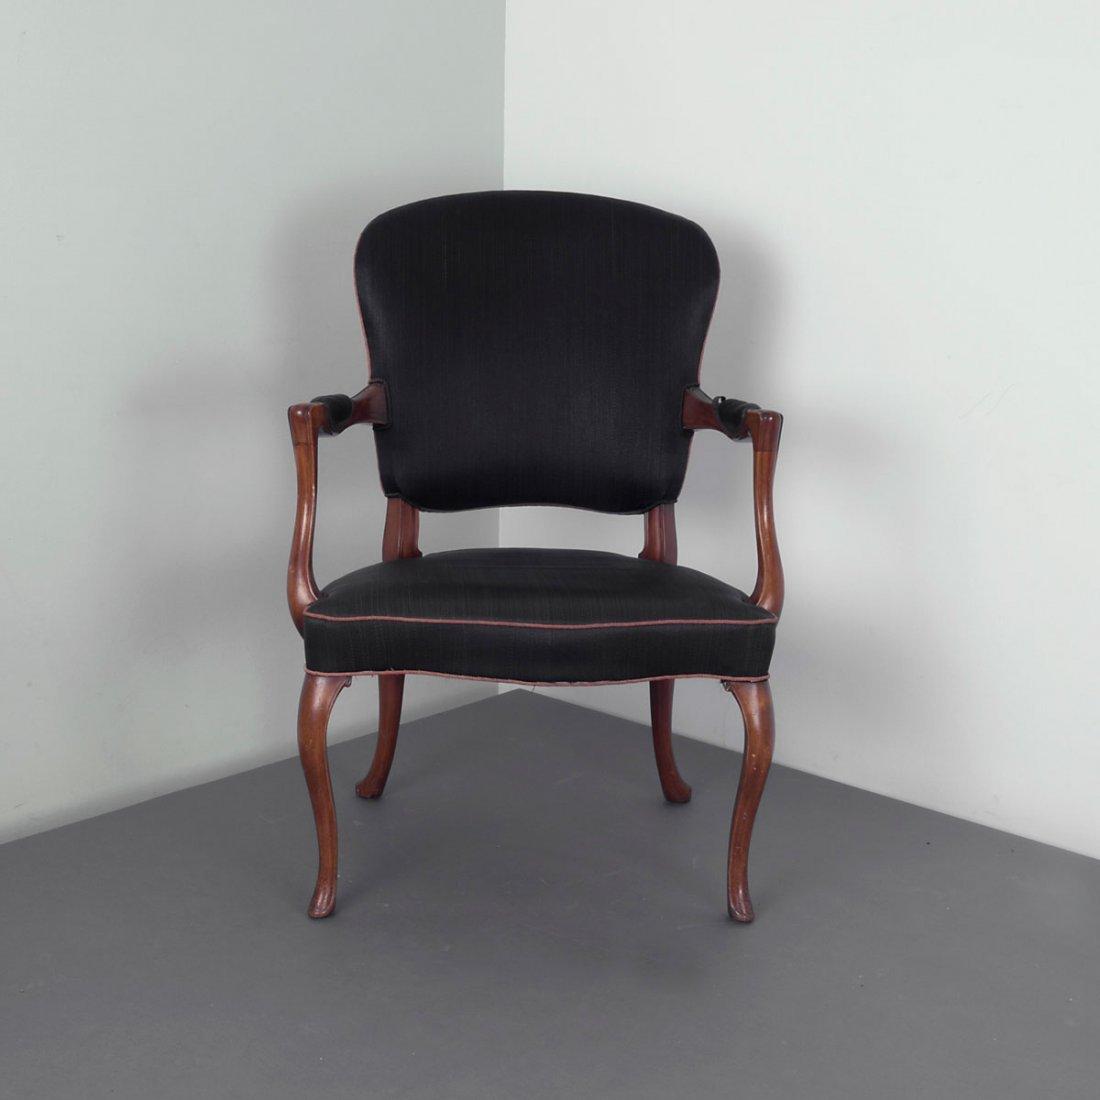 Frits Henningsen. Armchair, c1935. H. 90 x 64 x 67 cm.